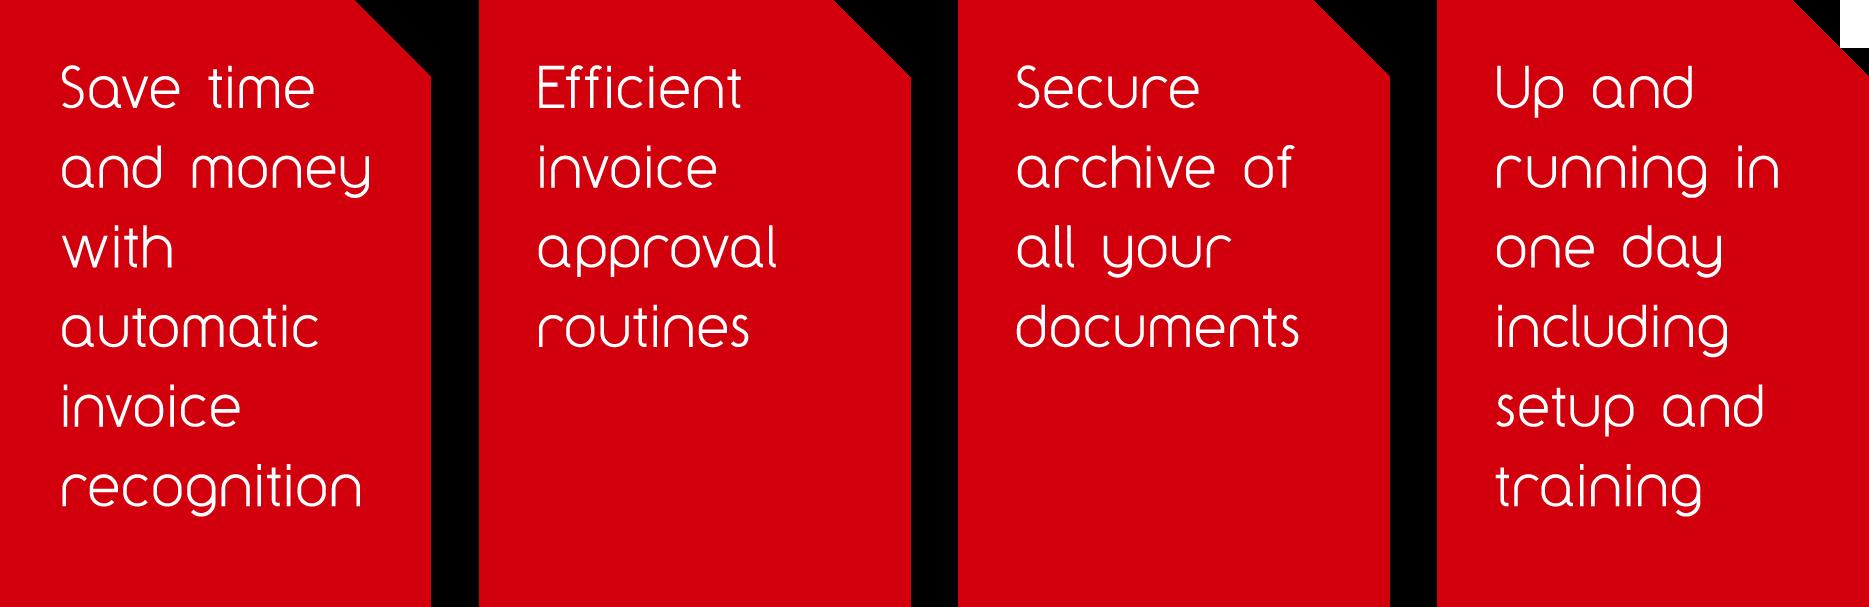 PaperLess Document Management Methodolody